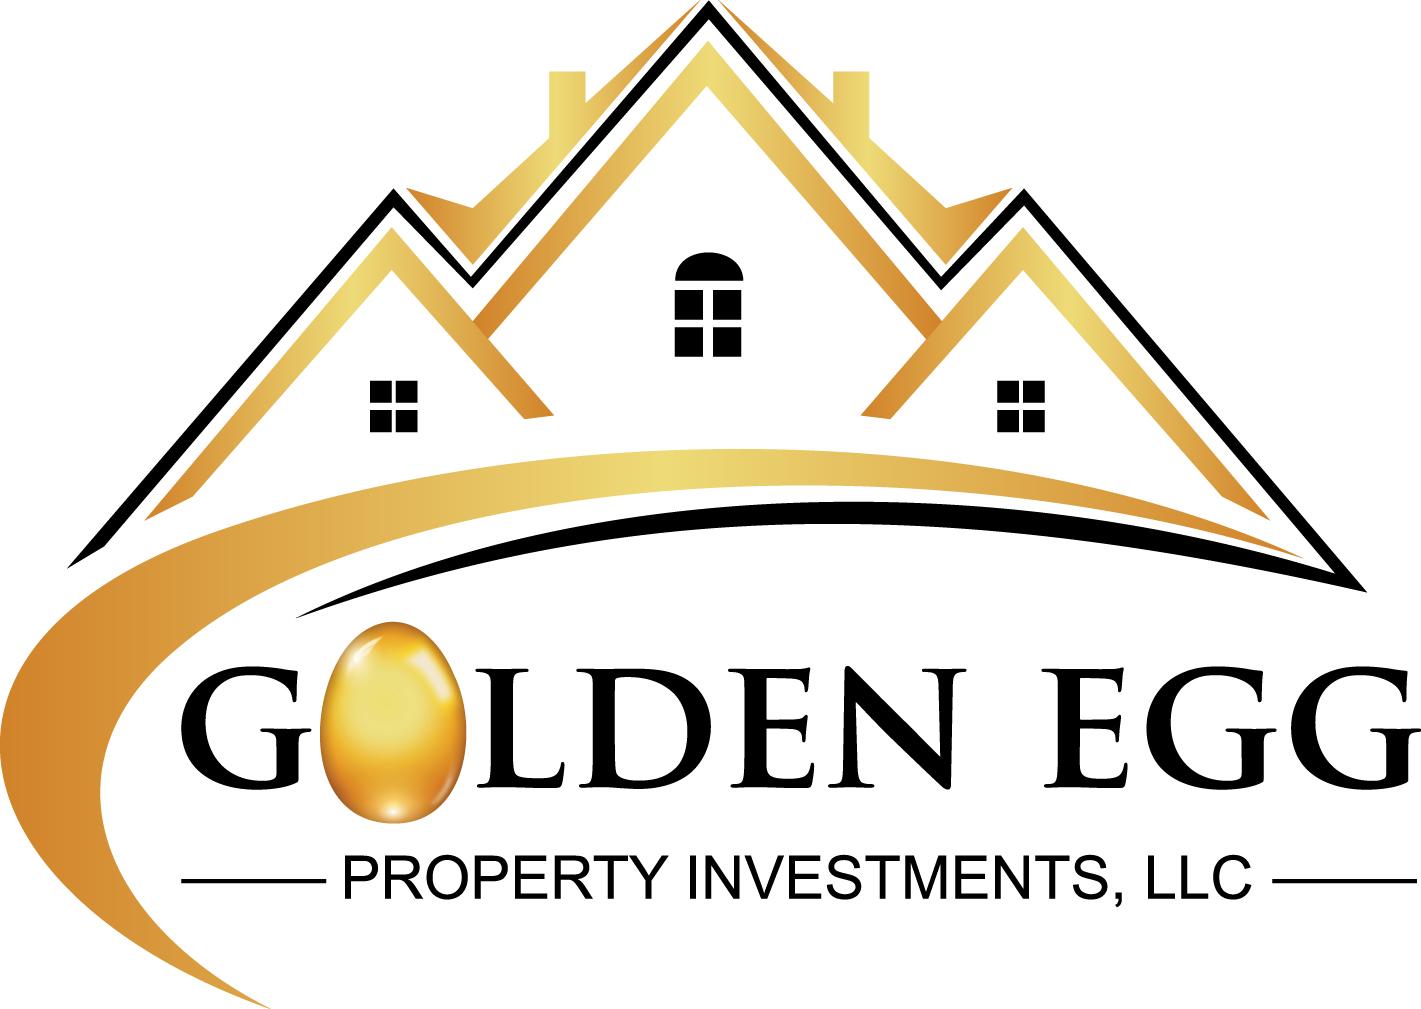 Golden Egg Property Investments, LLC